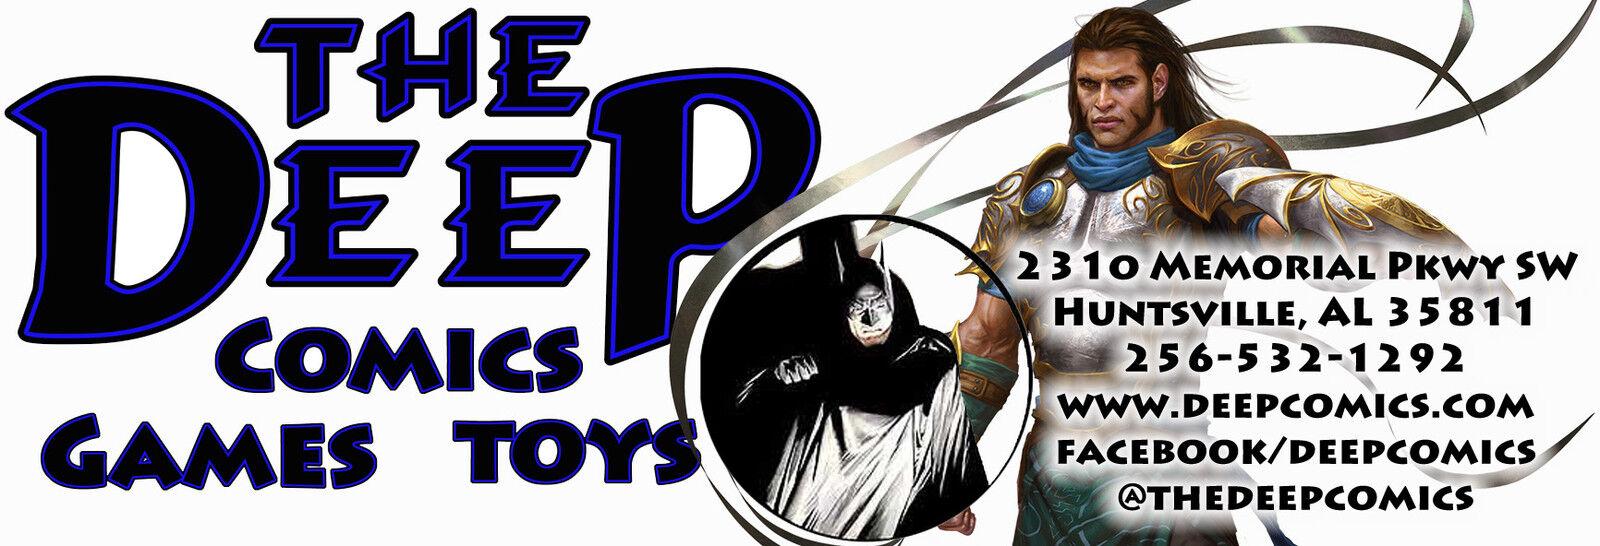 The Deep, Comics Games & Toys!